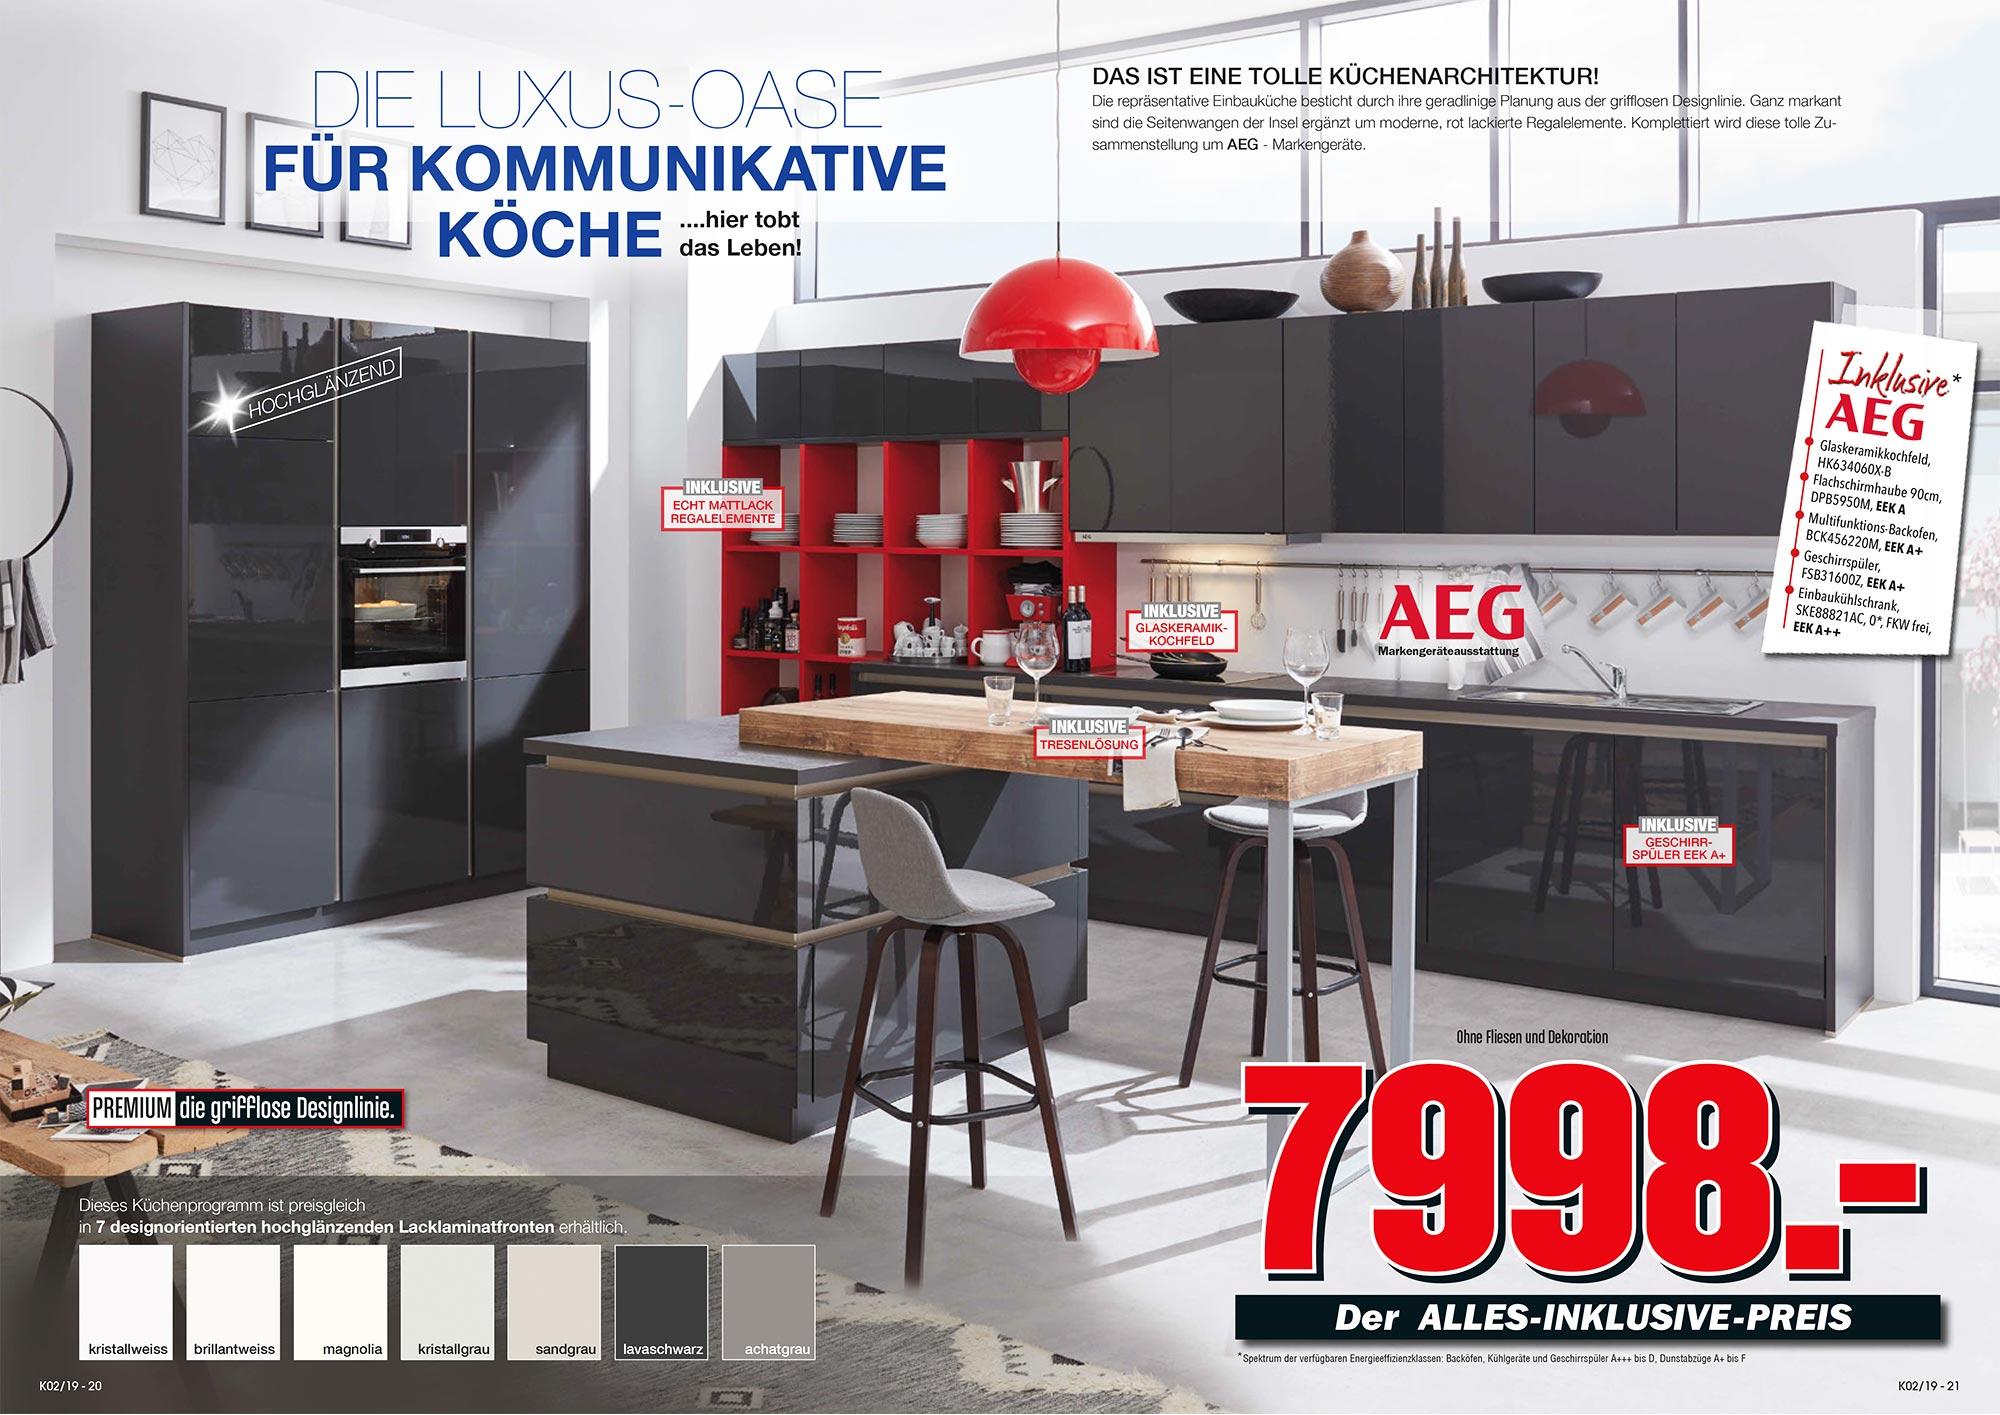 kuechen aktuell de awesome breite strae berlin spandau with kuechen aktuell de awesome die. Black Bedroom Furniture Sets. Home Design Ideas